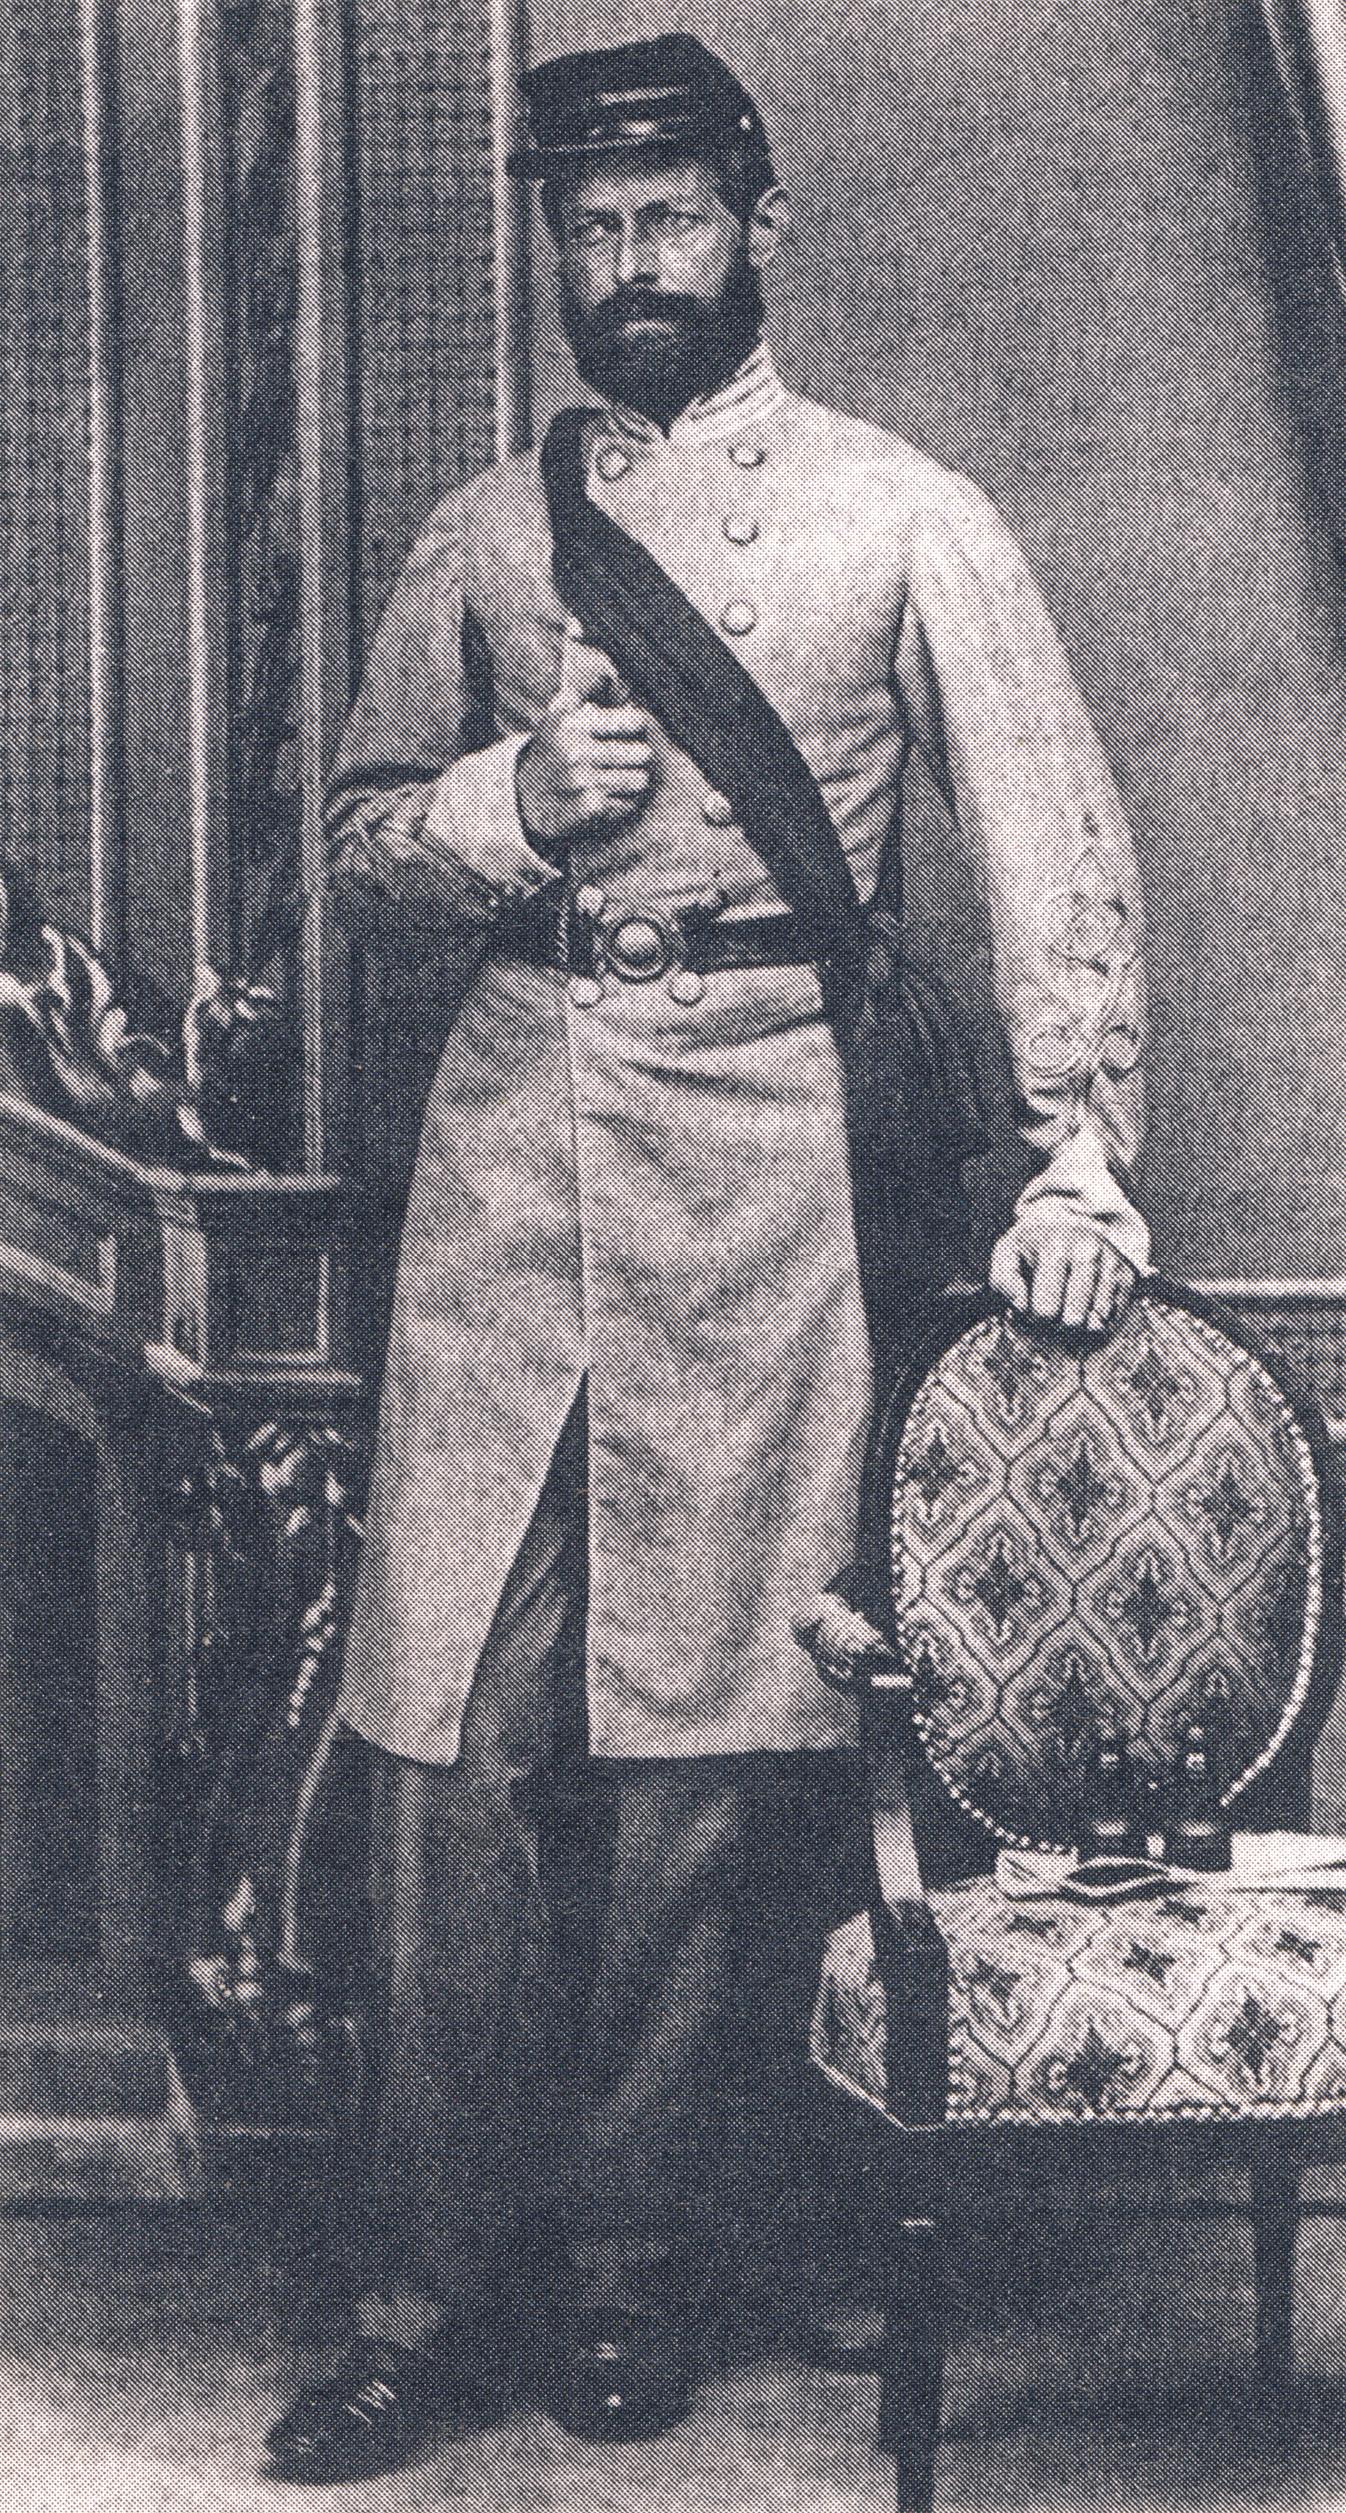 Captain Henry Wirz (1823-65)